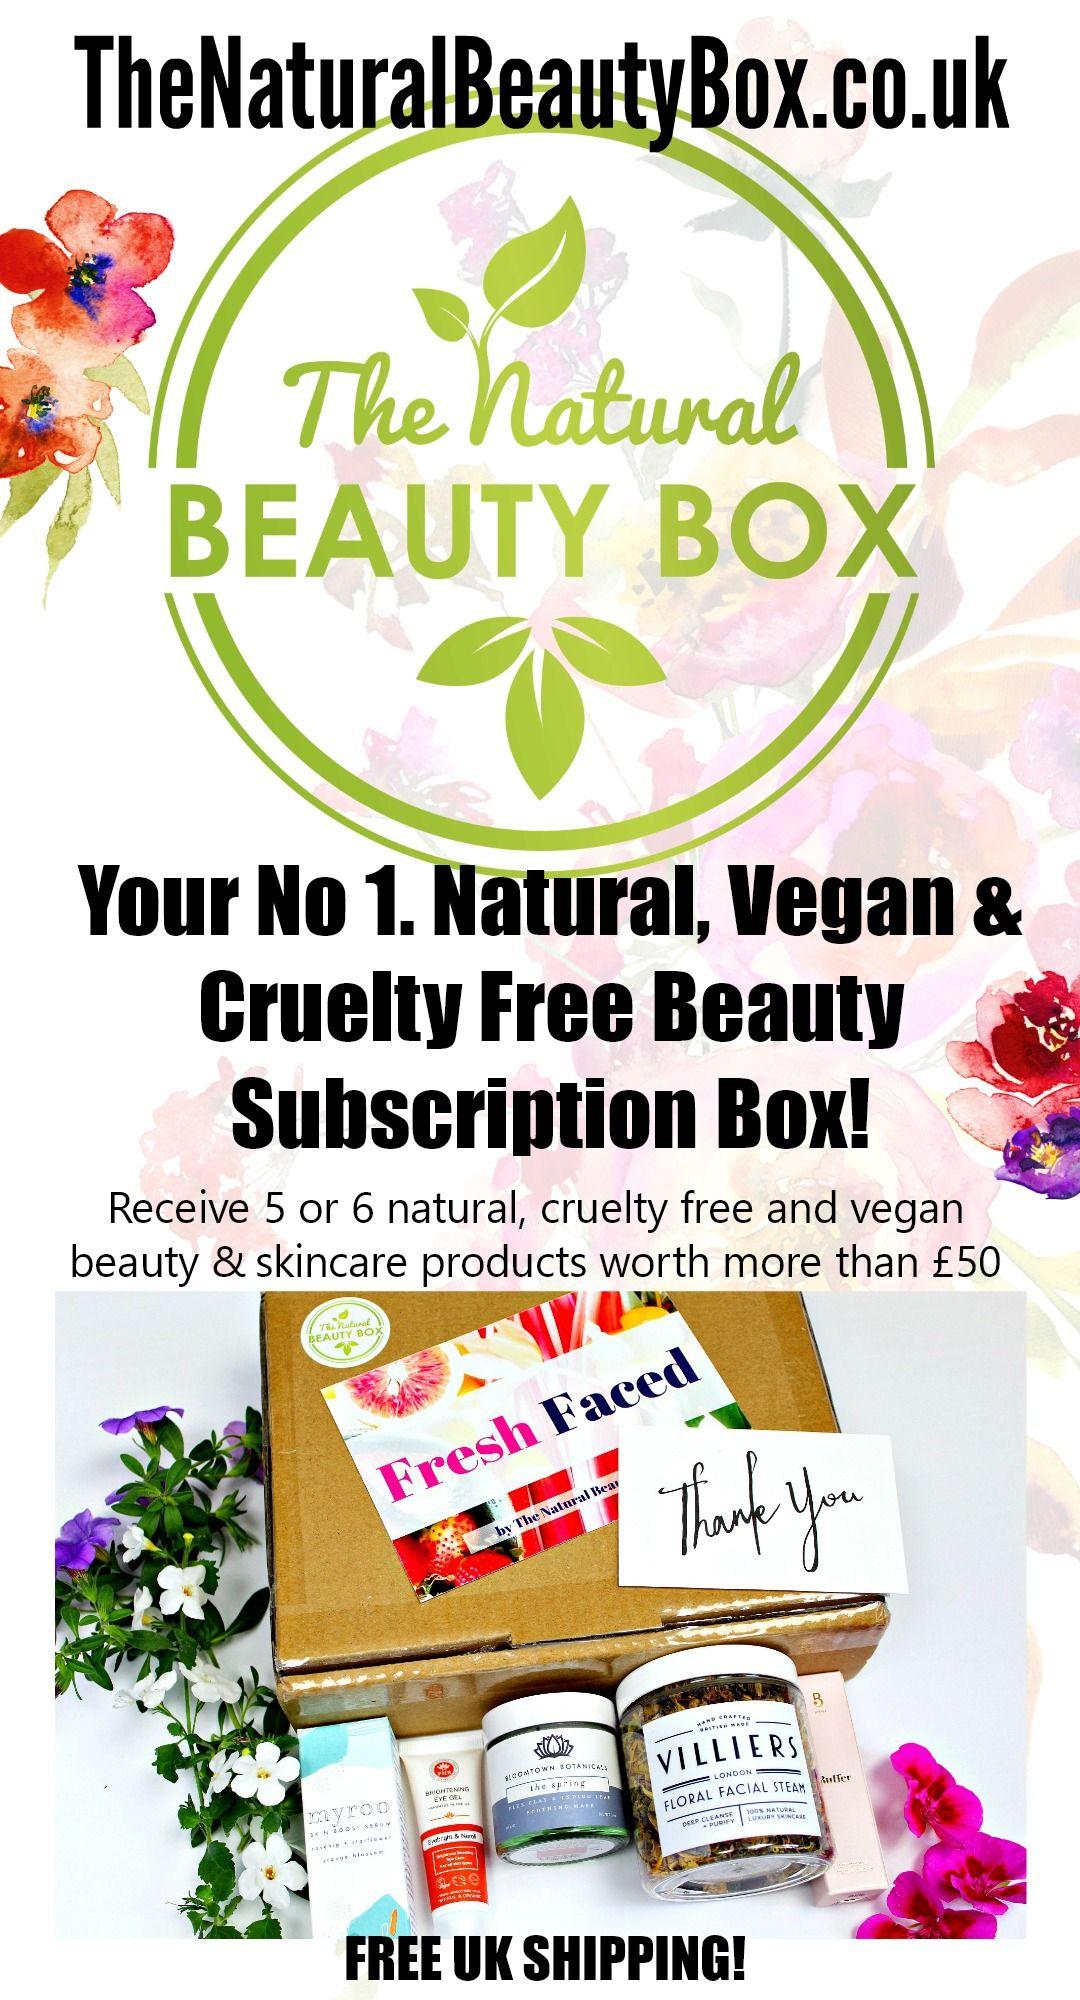 TheNaturalBeautyBox.co.uk Your No 1. Natural, Vegan